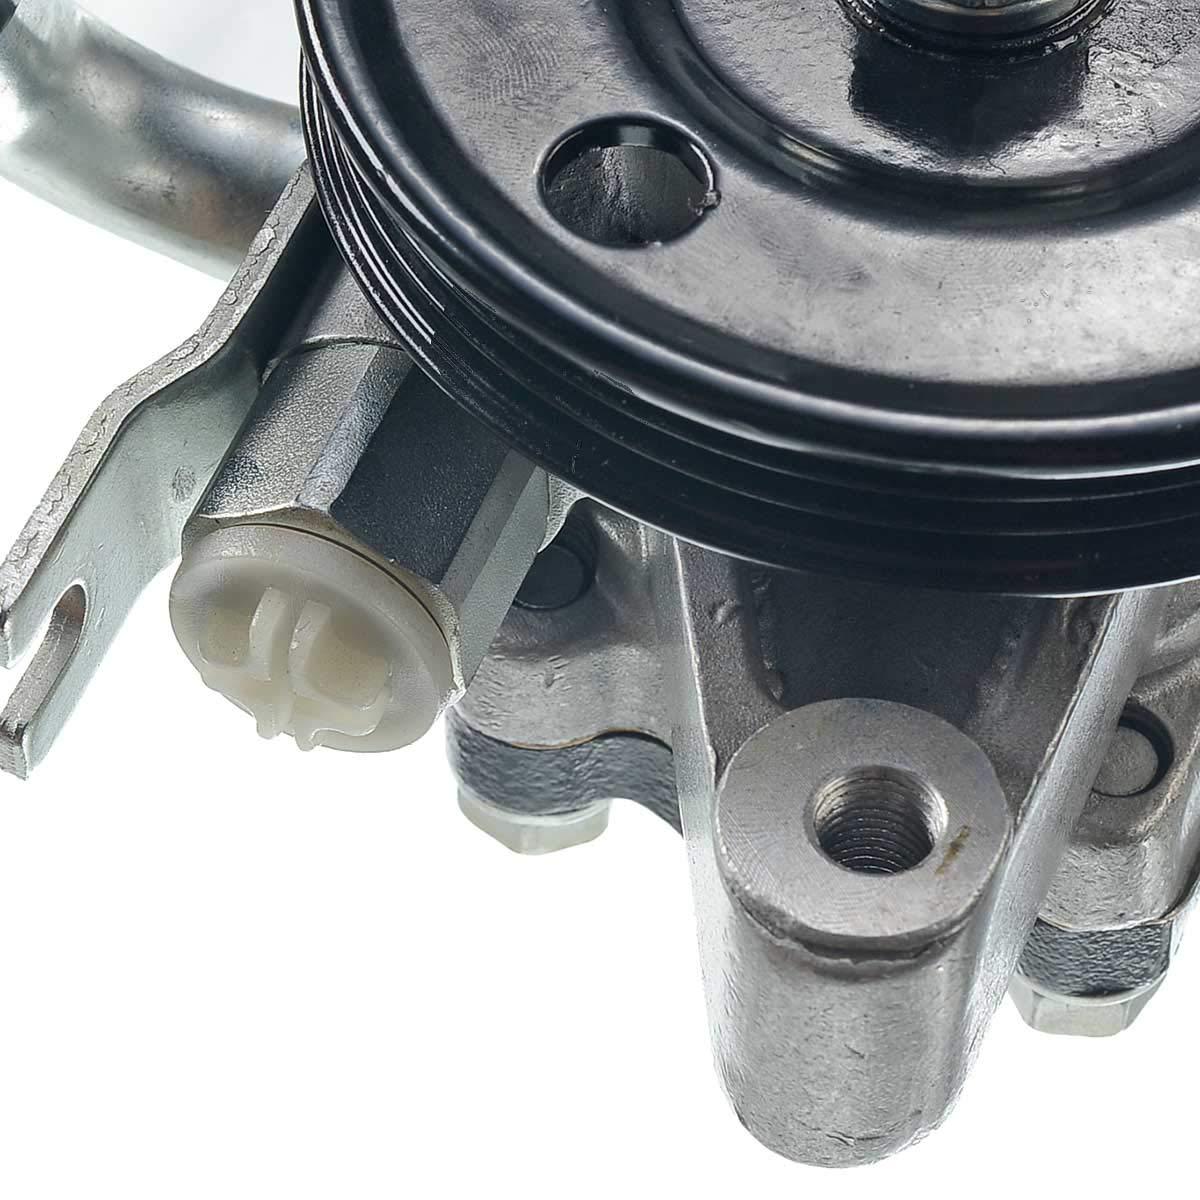 Servopumpe Servolenkung Hydraulikpumpe f/ür TUCSON SPORTAGE JM JE/_ KM/_ 2004-2010 571002E000